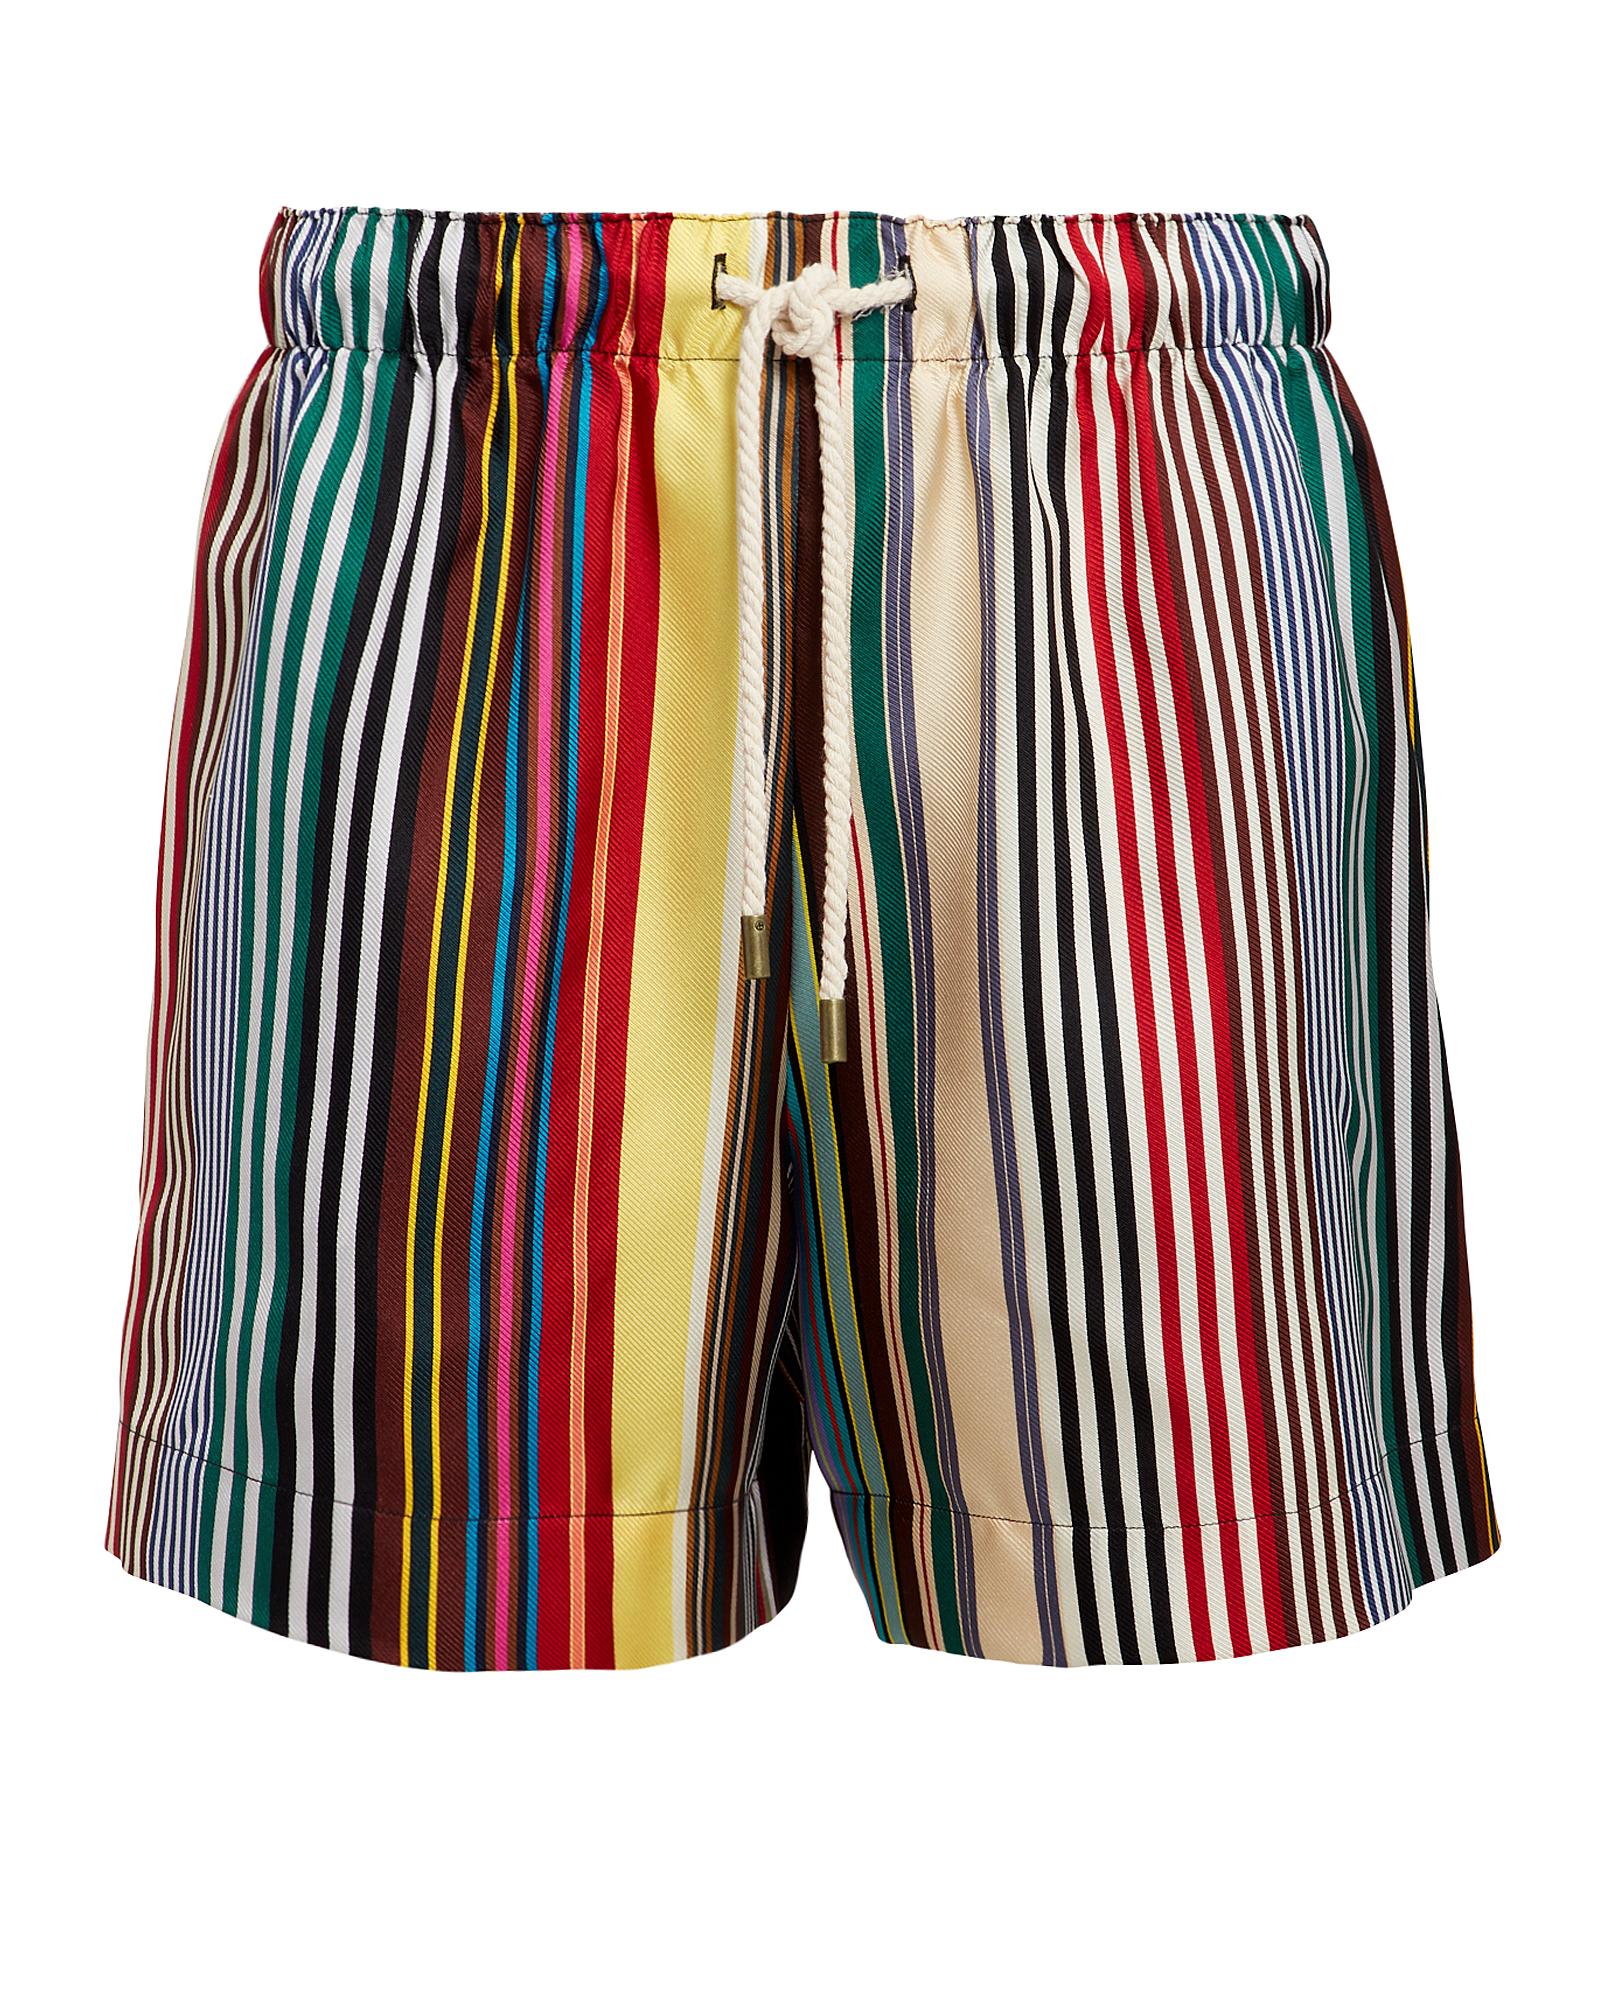 Monse Shorts Rainbow Striped Shorts